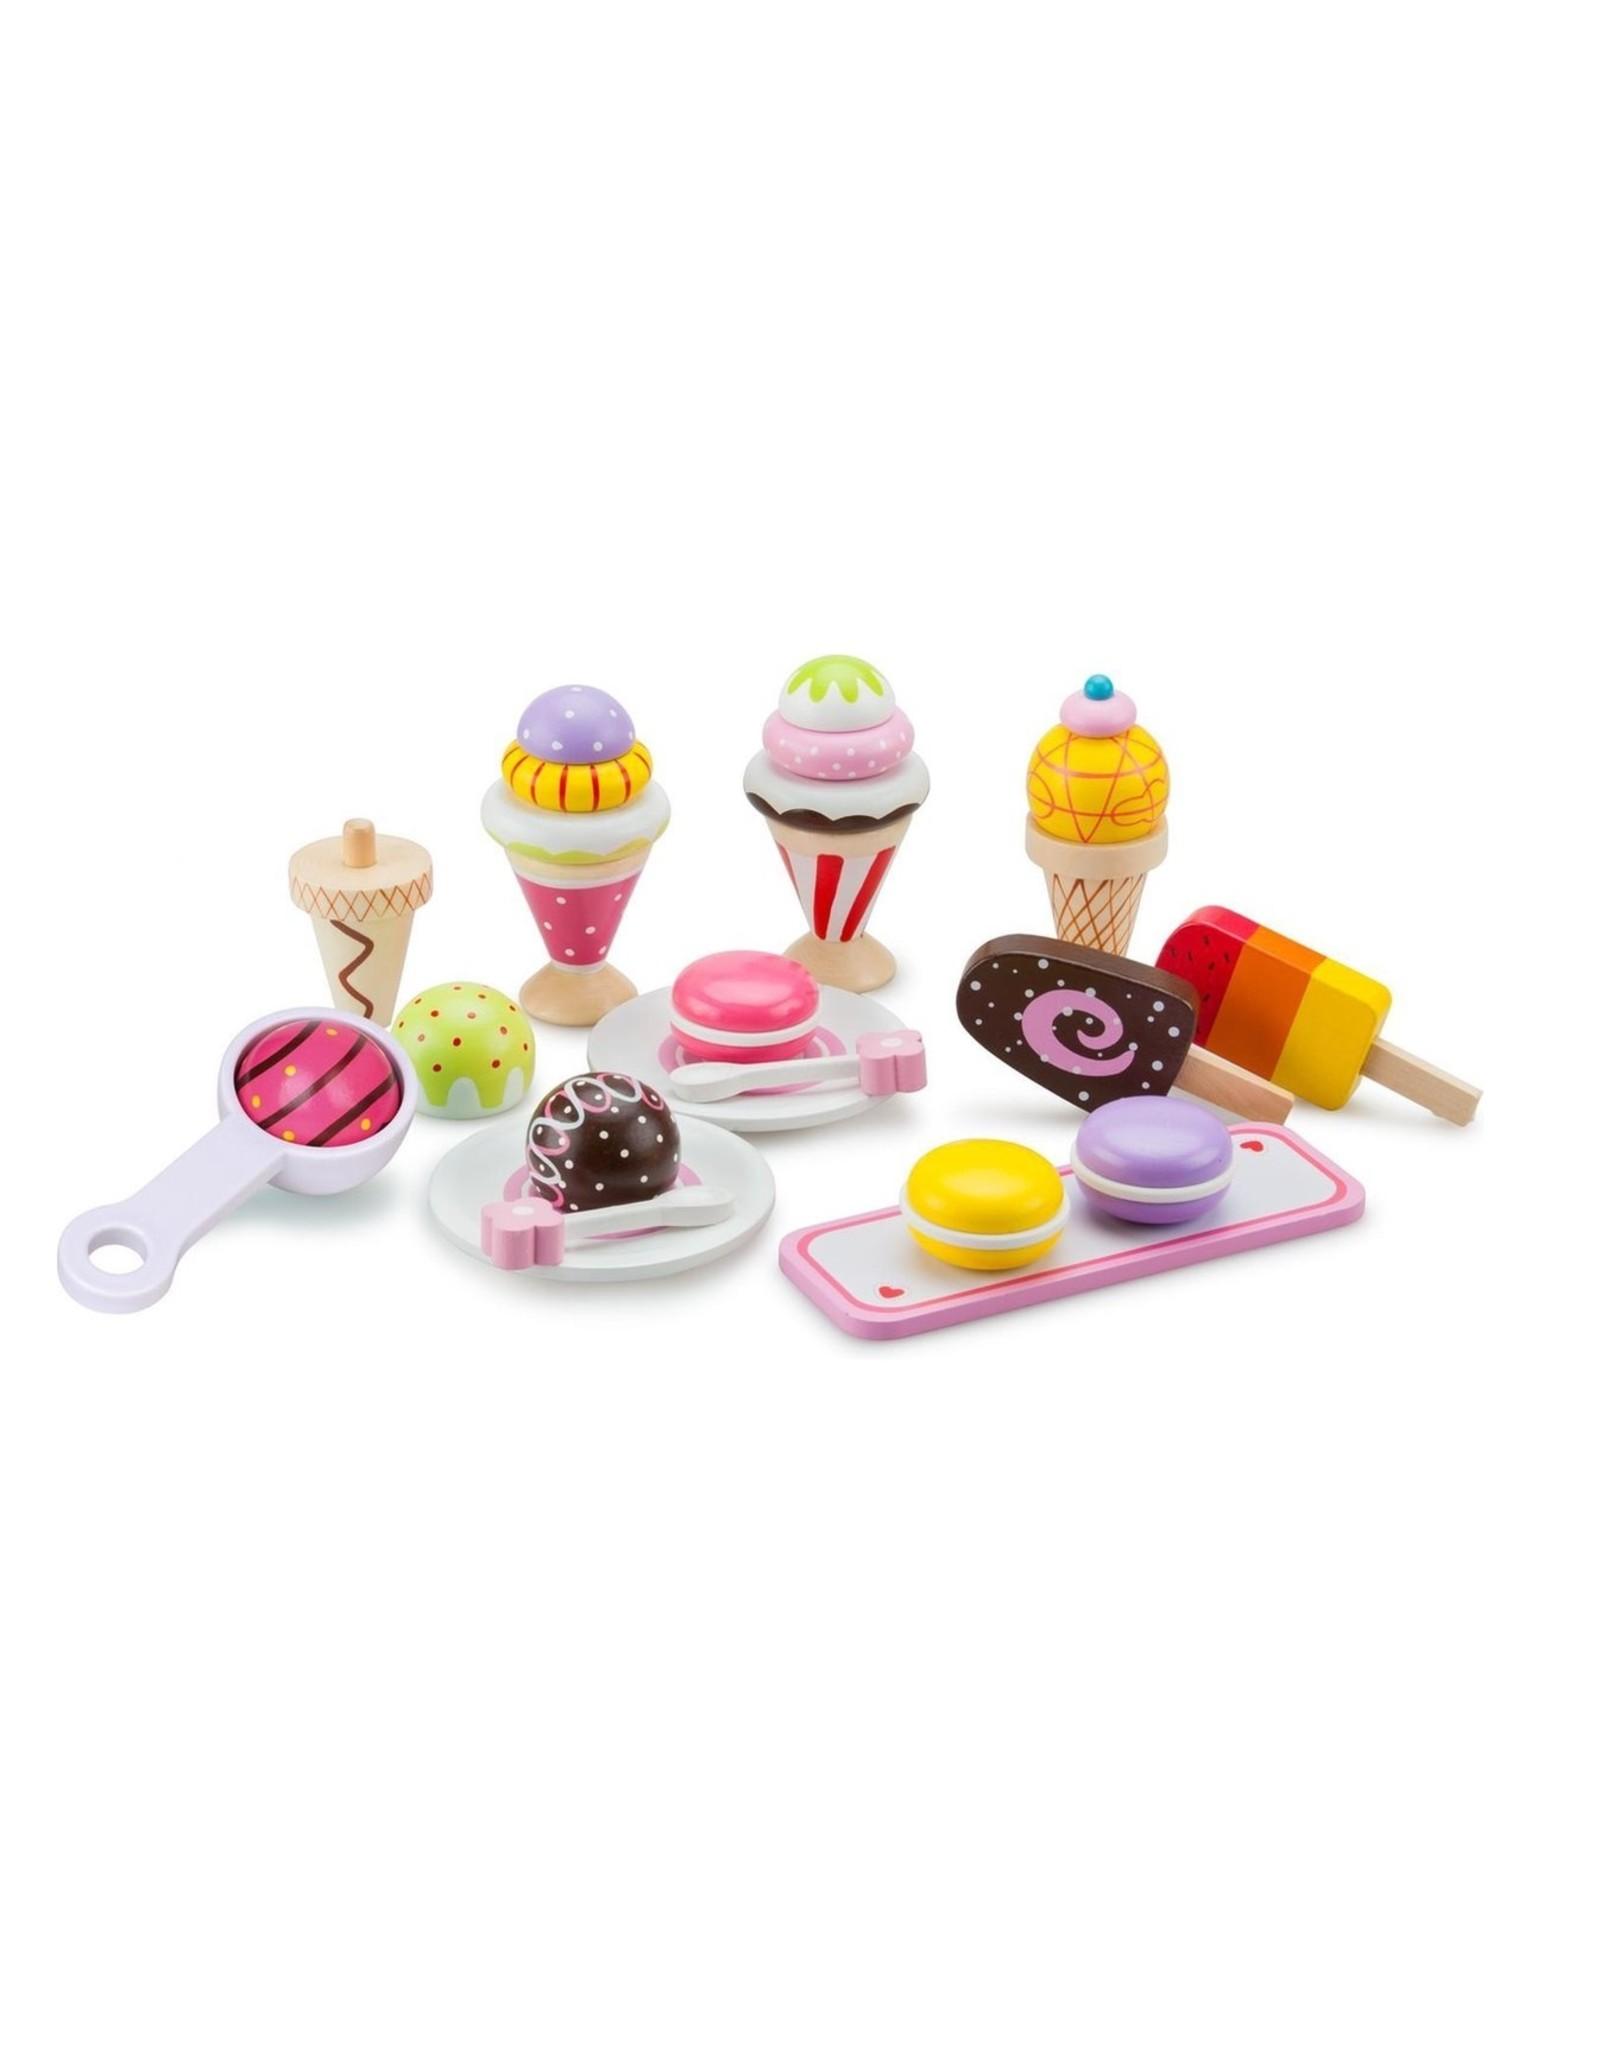 New Classic Toys - Luxe Speelgoed IJs Set - 21 delig - EV